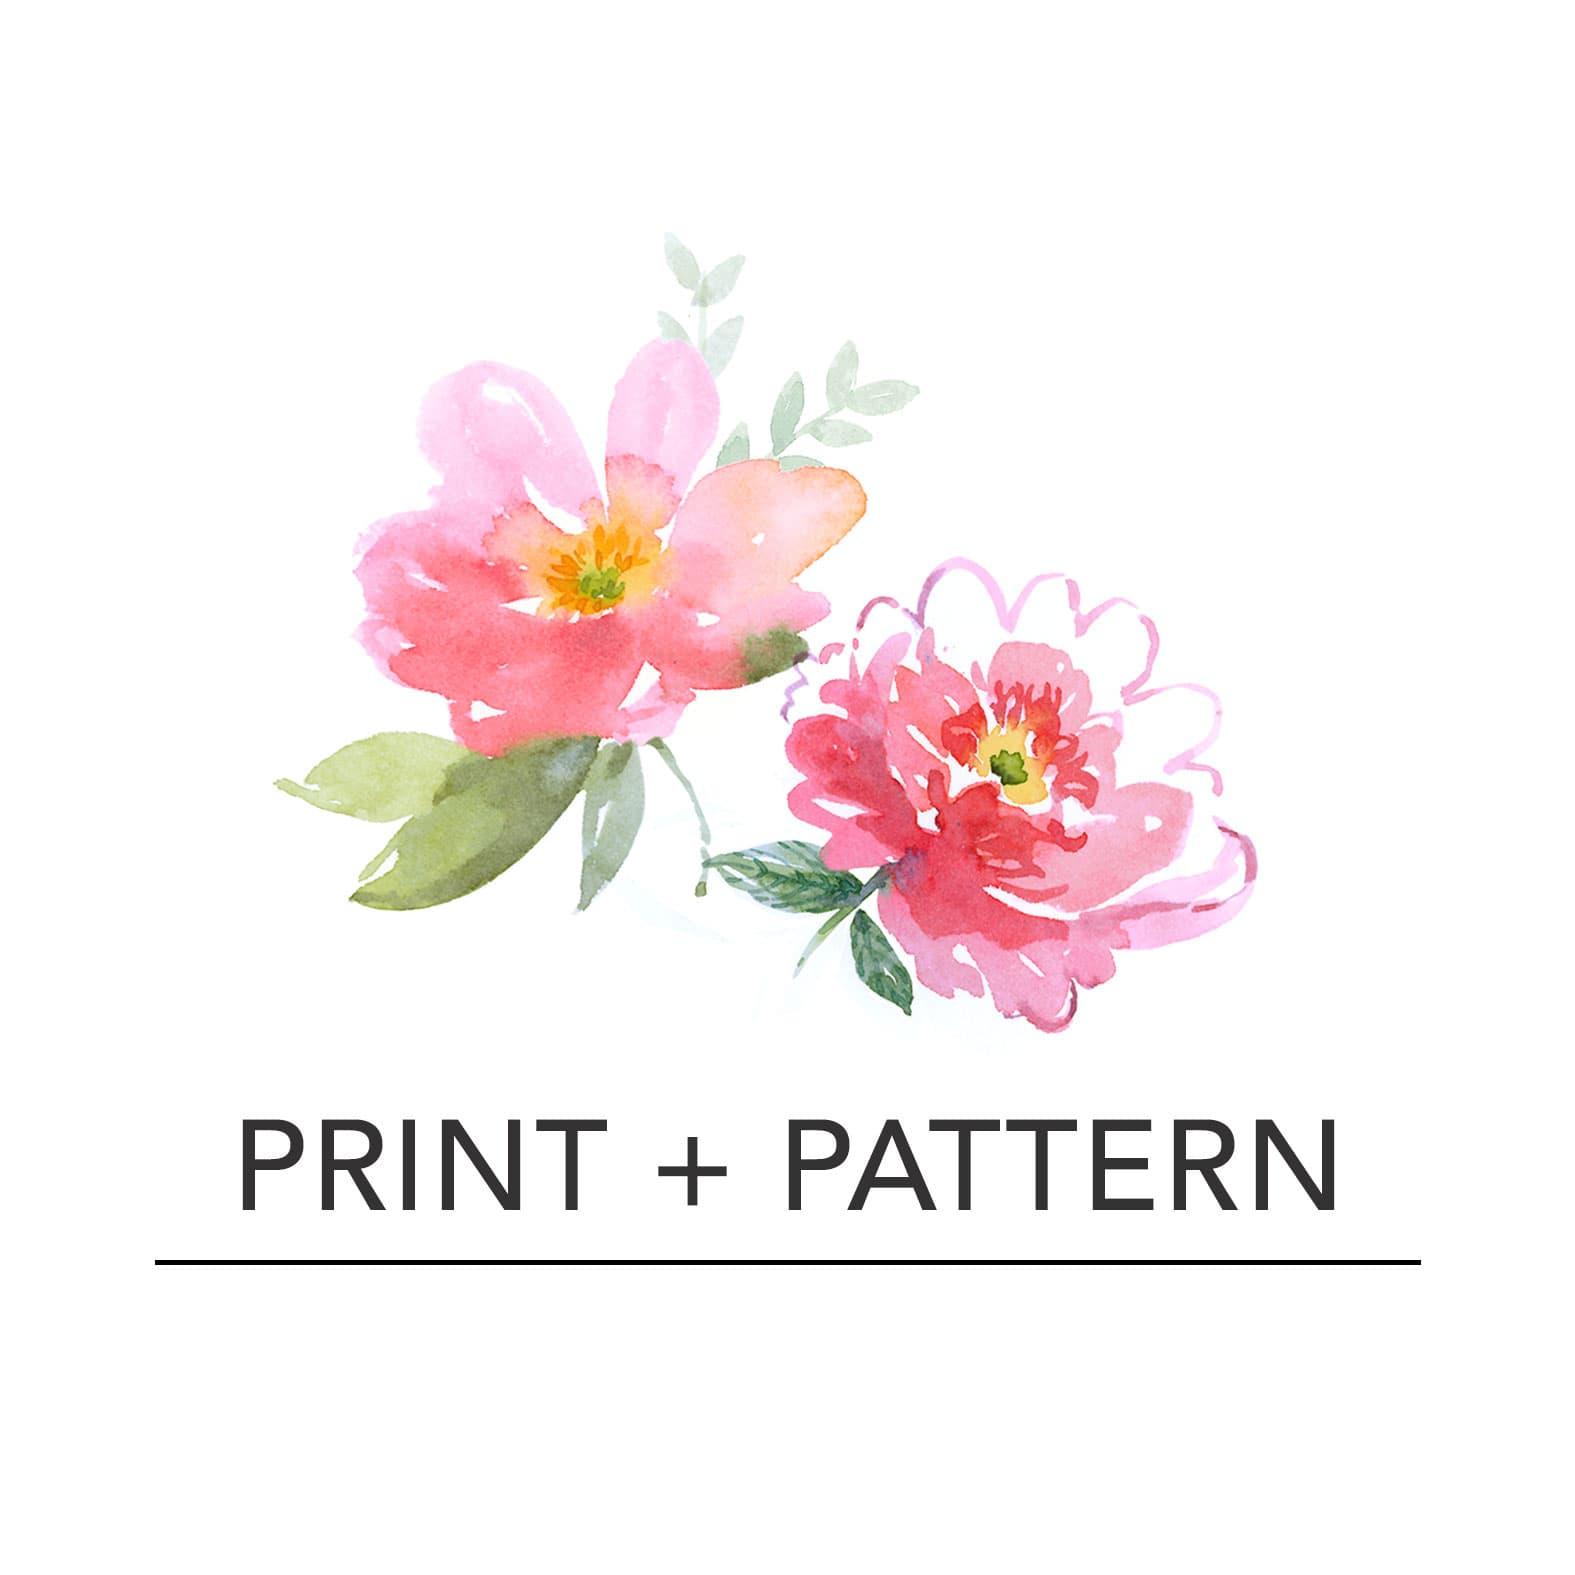 Print-Pattern-8A.jpg